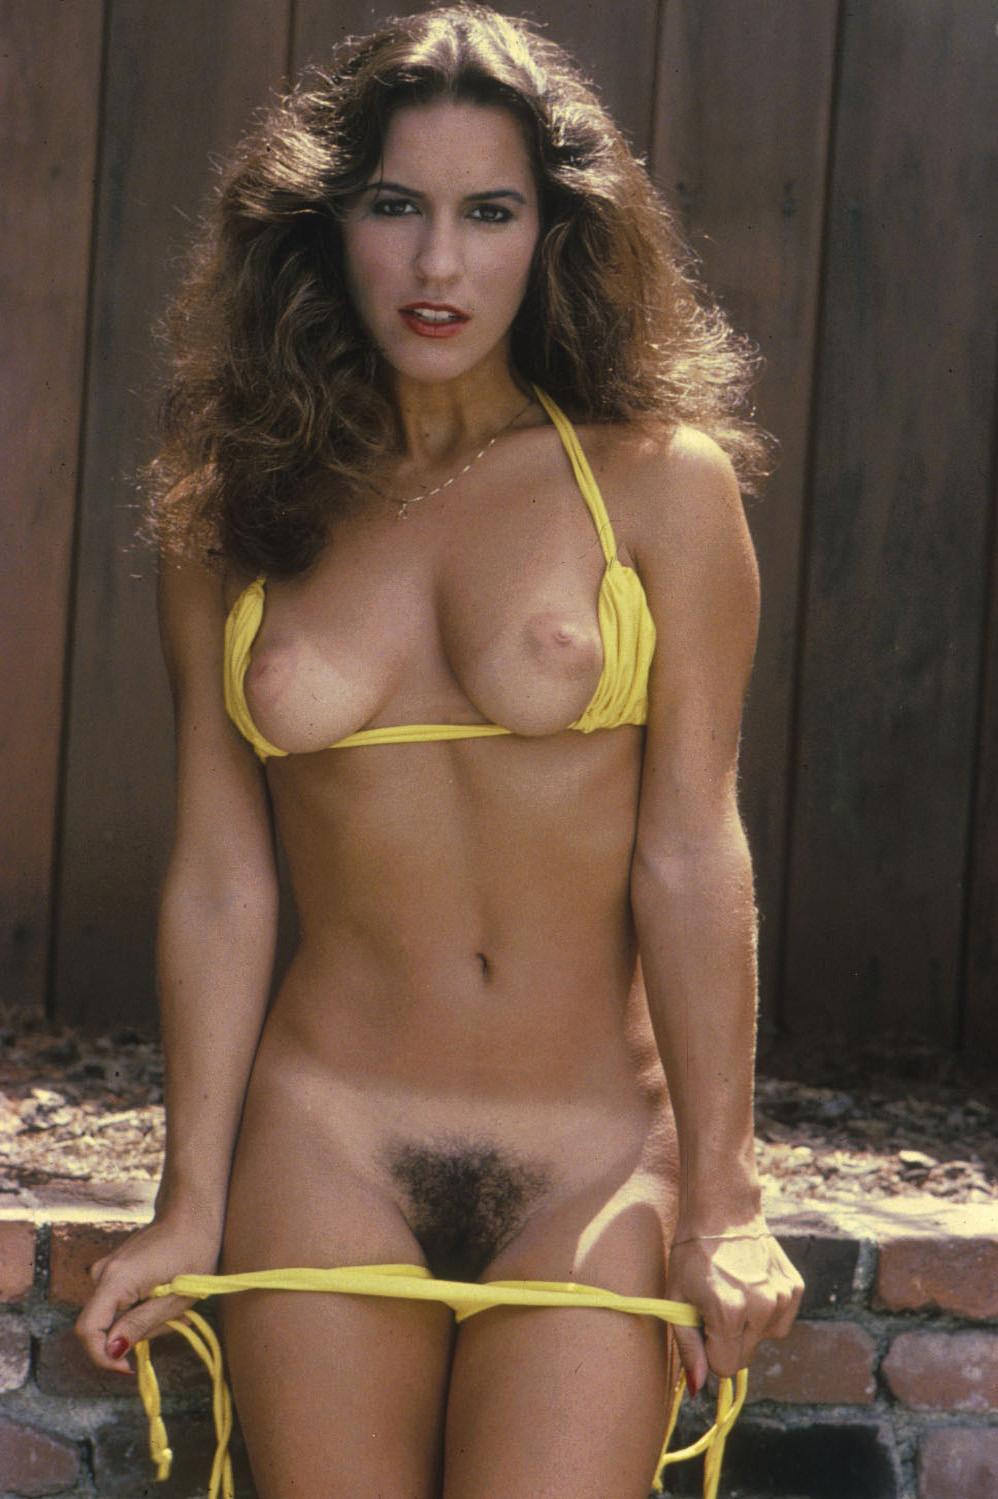 Pornstar Tina Ross aka Lauren Wilde 11.jpg